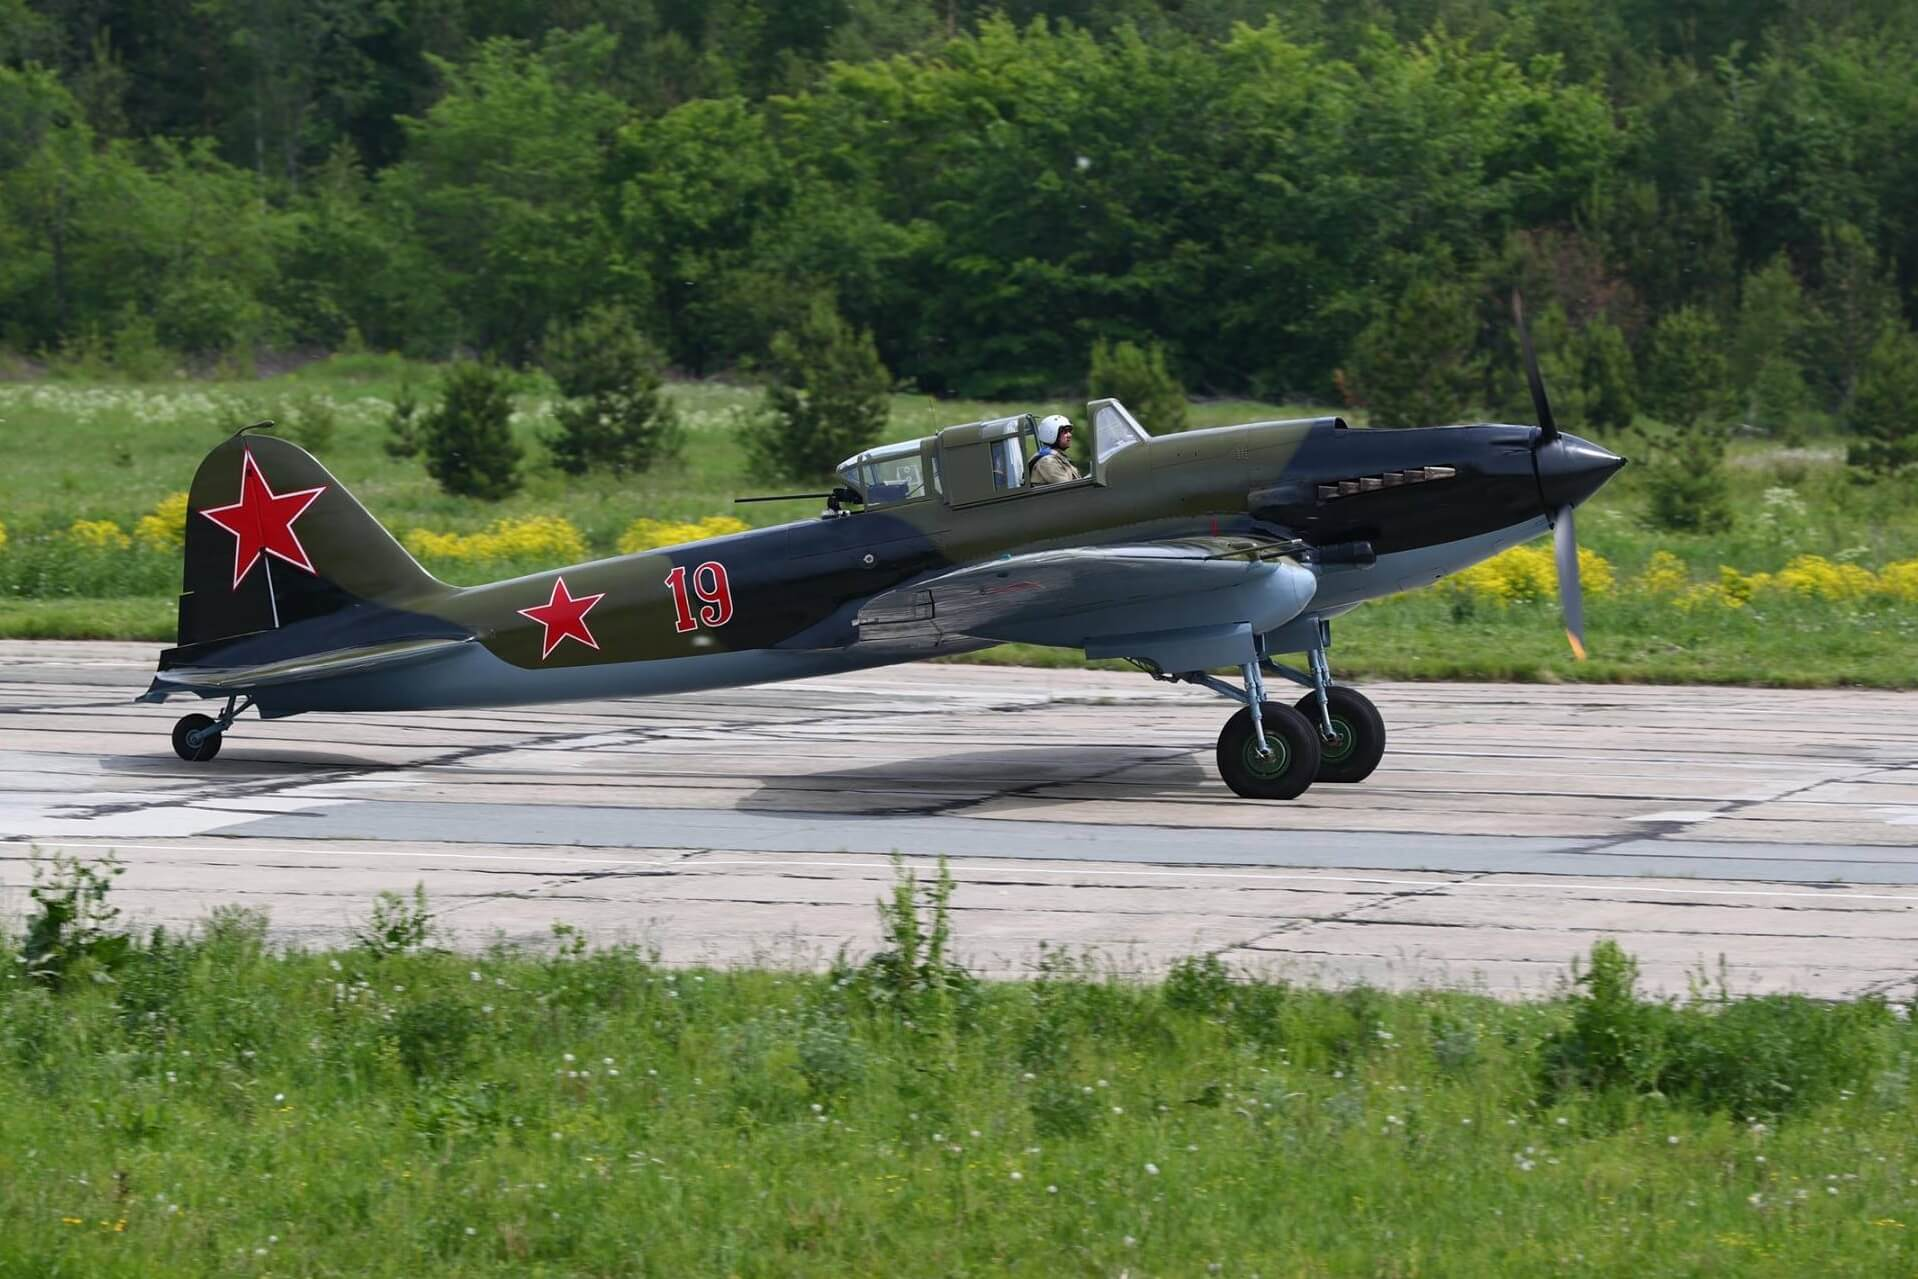 ИЛ-2. Фото: Info.sibnet.ru